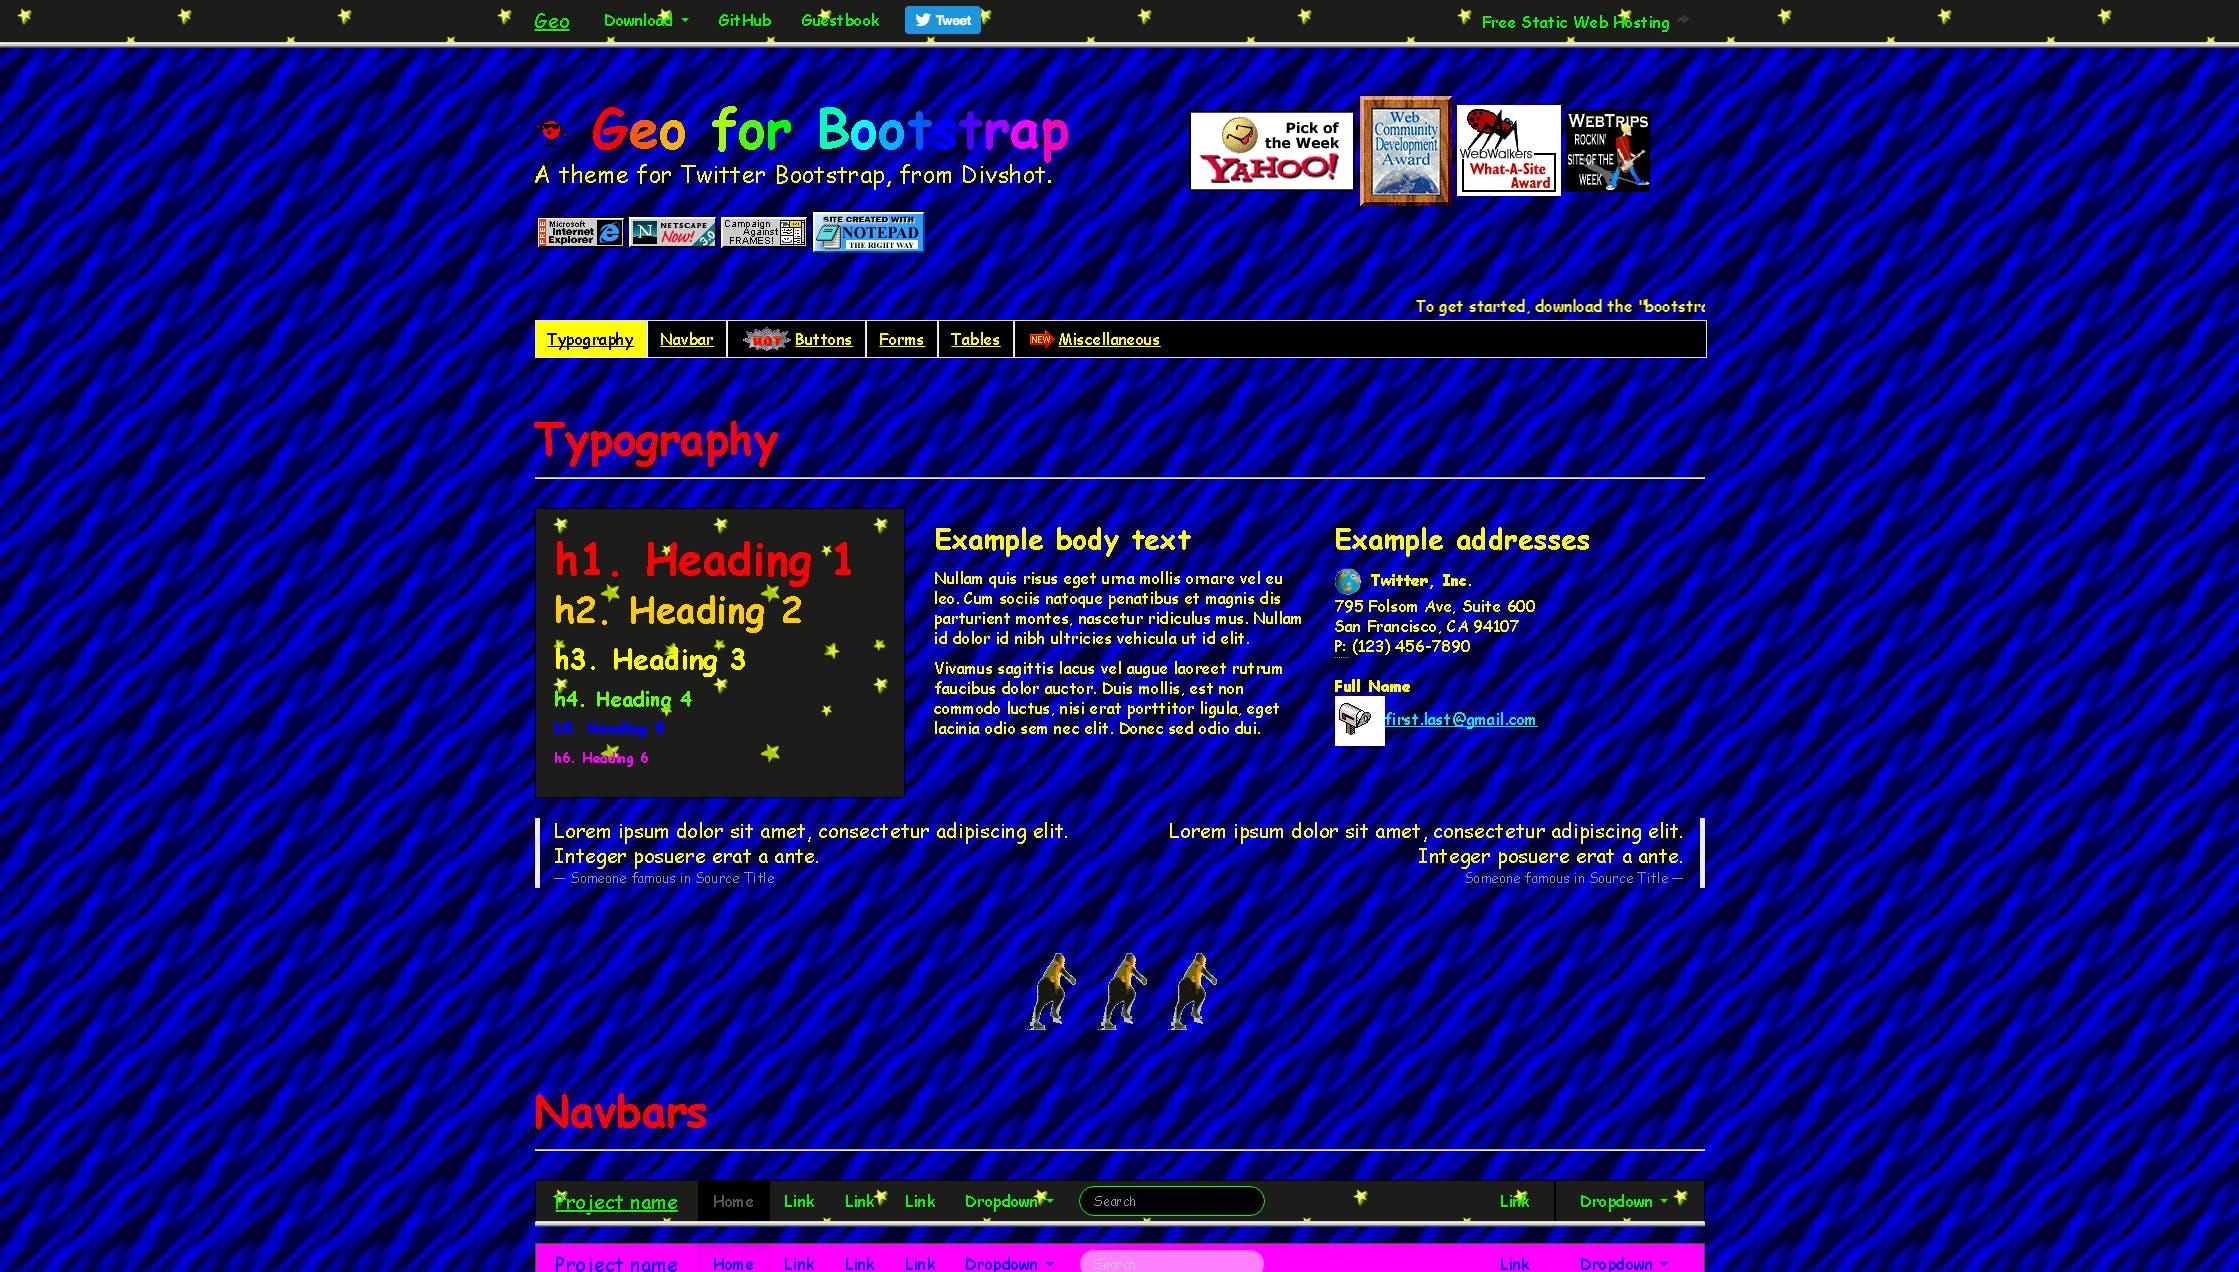 FireShot-Capture-2-Geo-for-Bootstrap-a-Timeless-Theme-b_-http___code.divshot.com_geo-bootstrap_.png